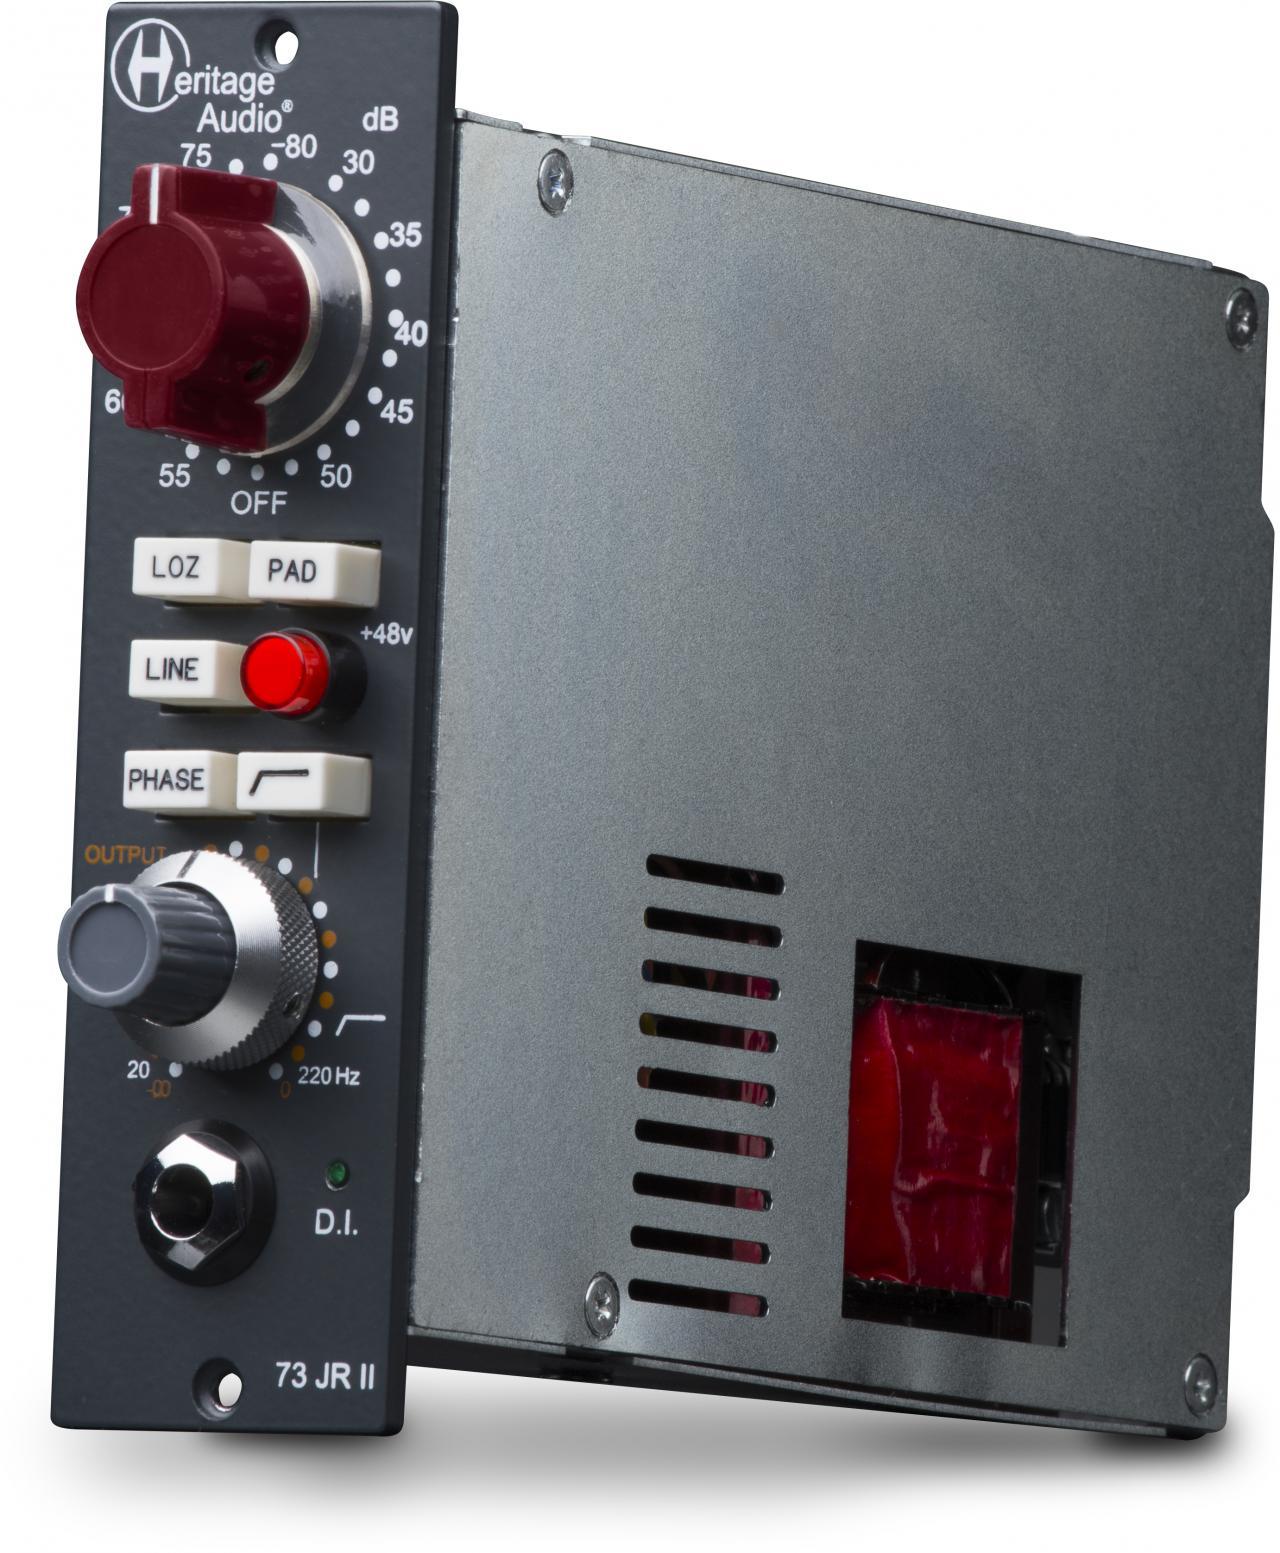 Heritage-Audio-73-JR-mkII-34-Left.jpg